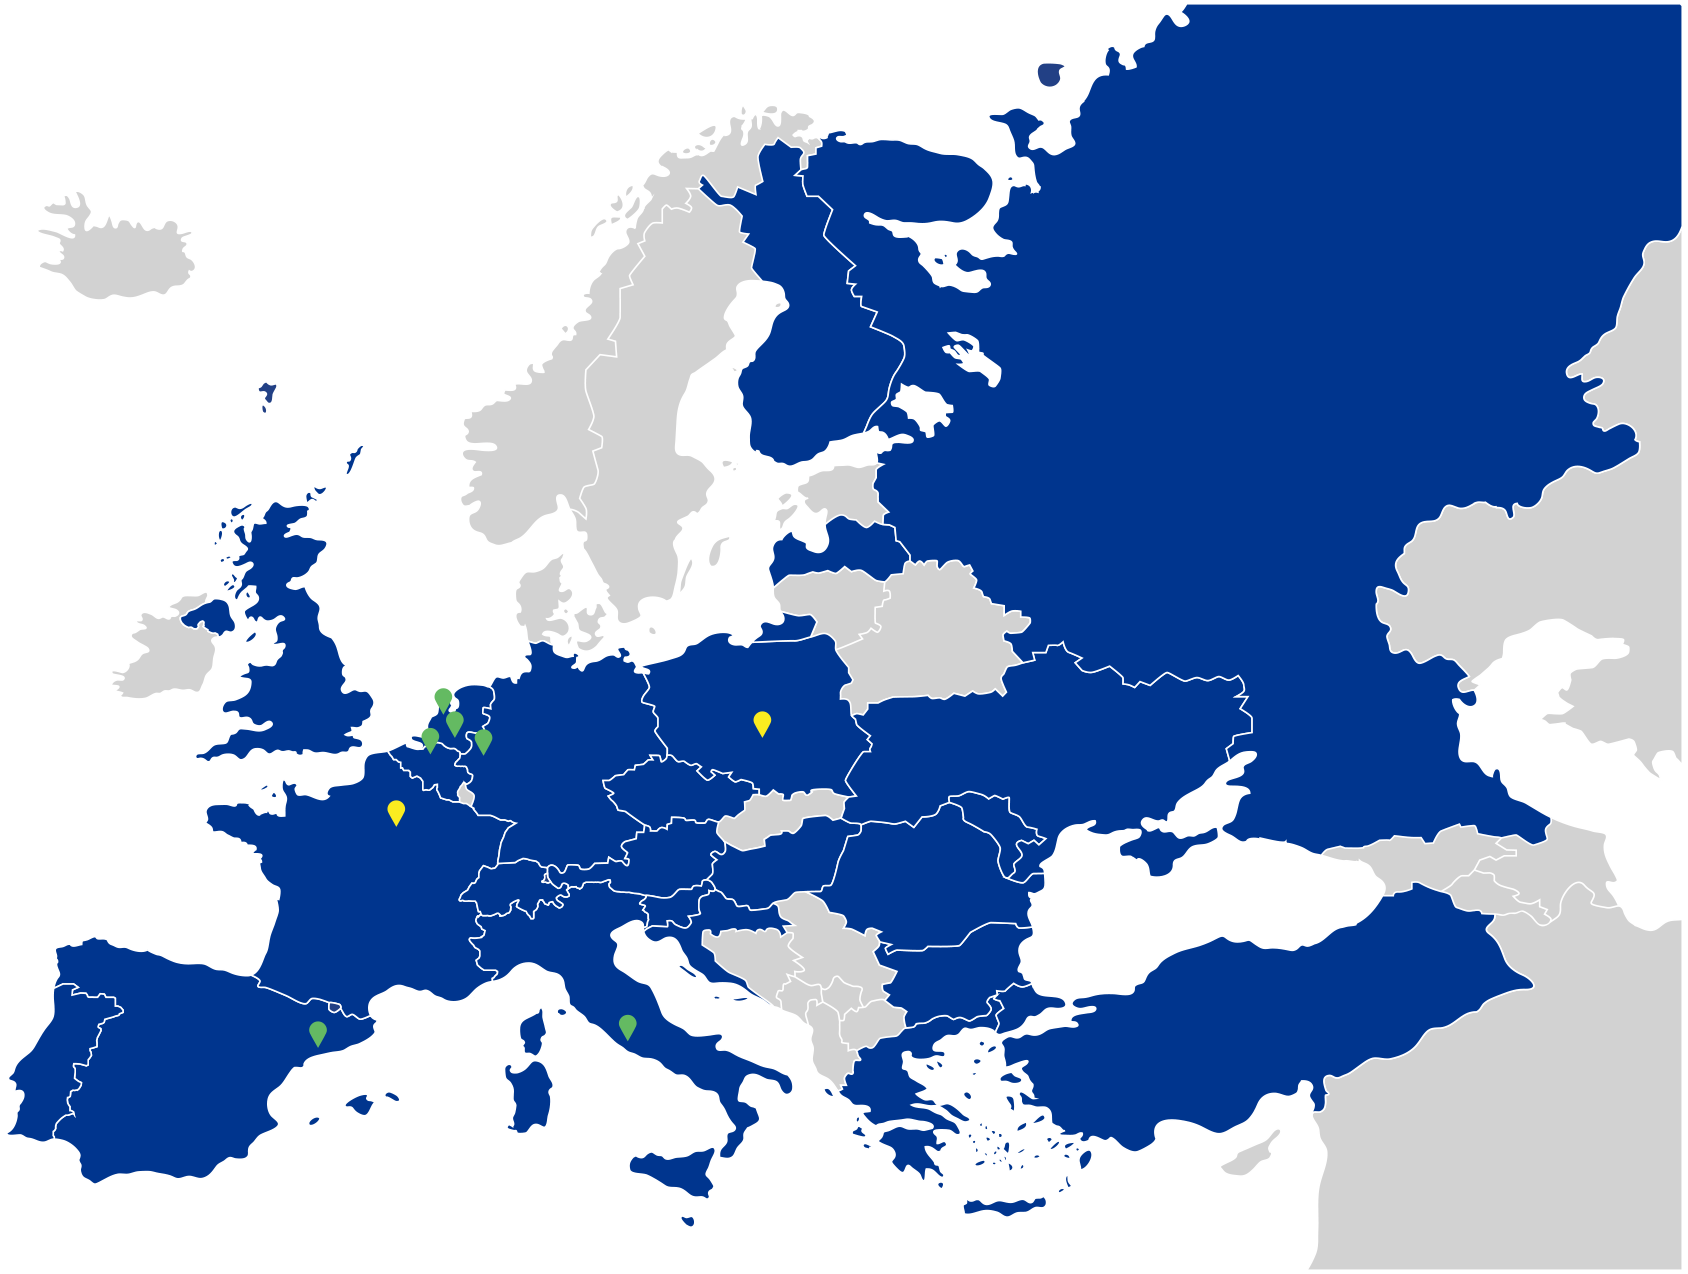 Dekking Europese incasso landen